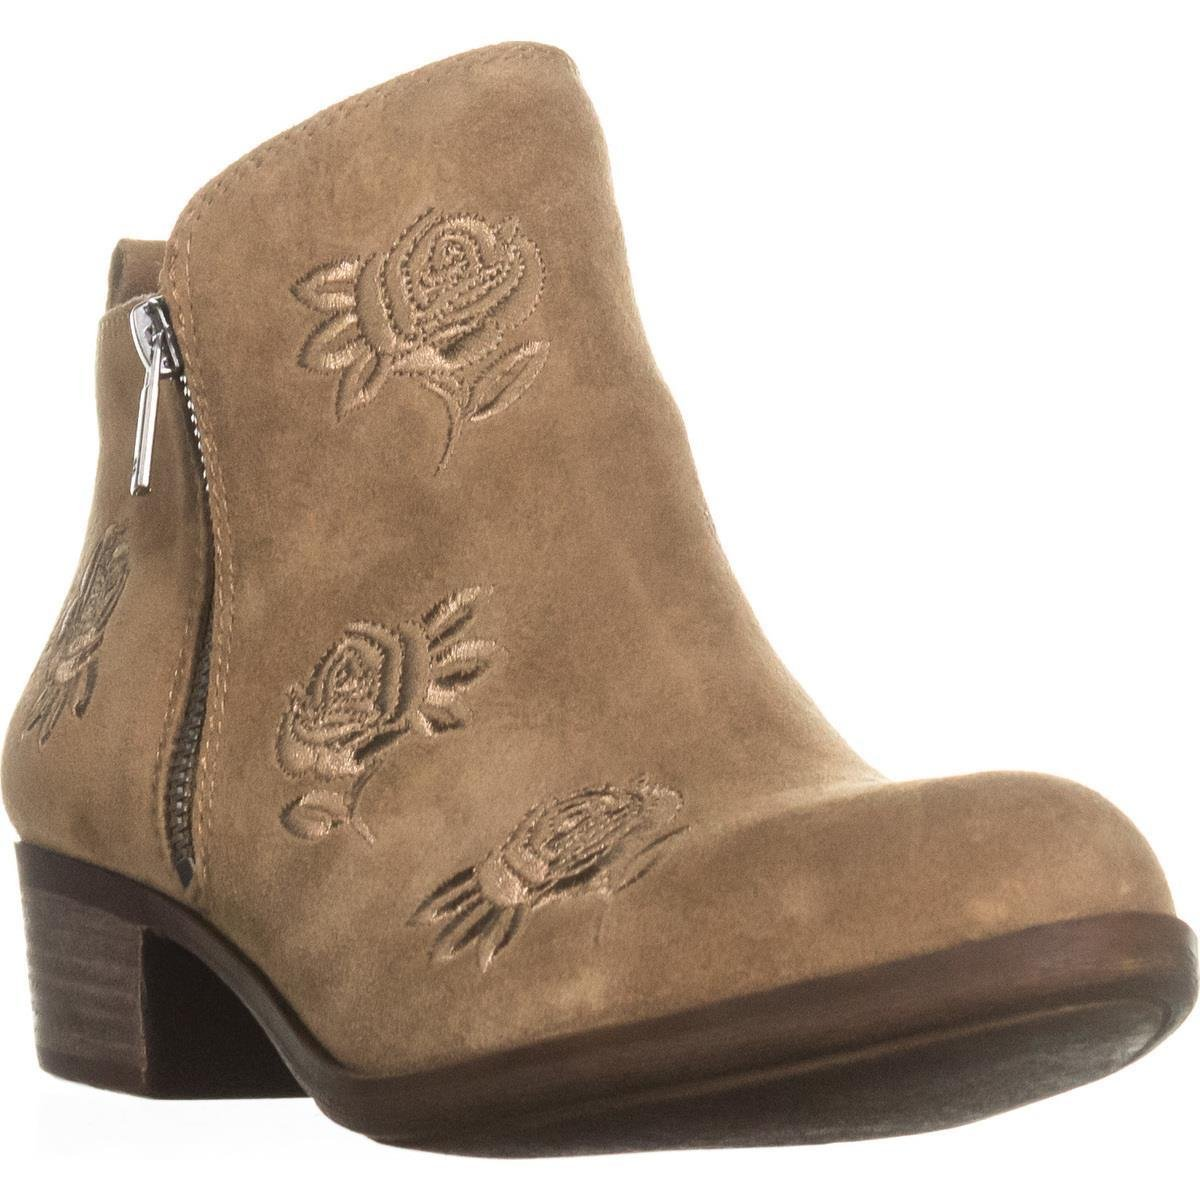 Lucky Brand Women's Basel Boot B075MKCB1X 8.5 B(M) US|Sesame 241